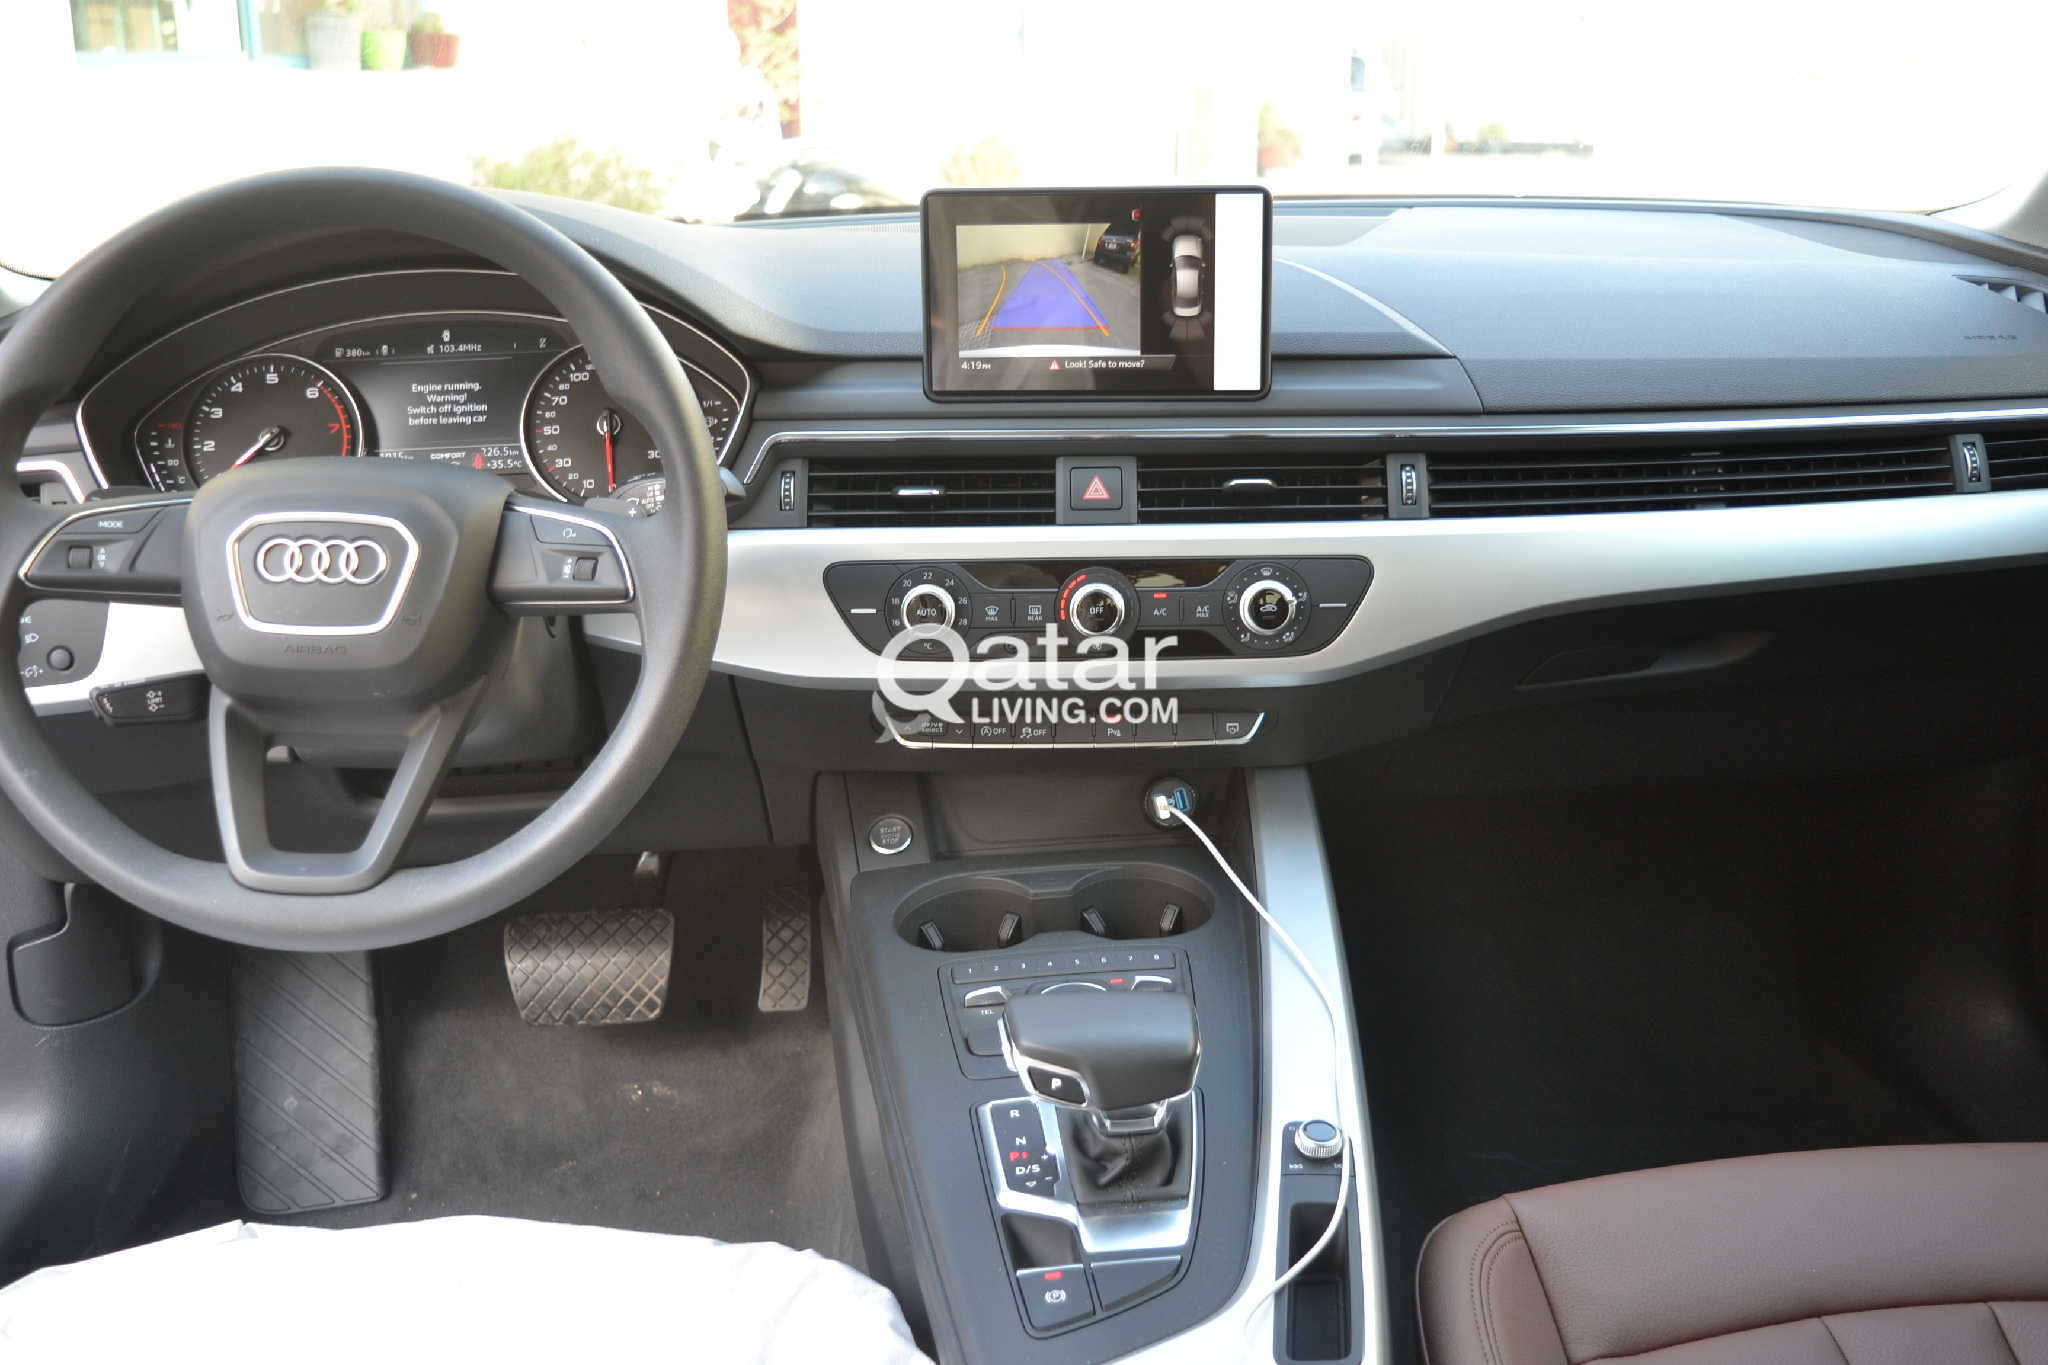 Brand new Audi S-line